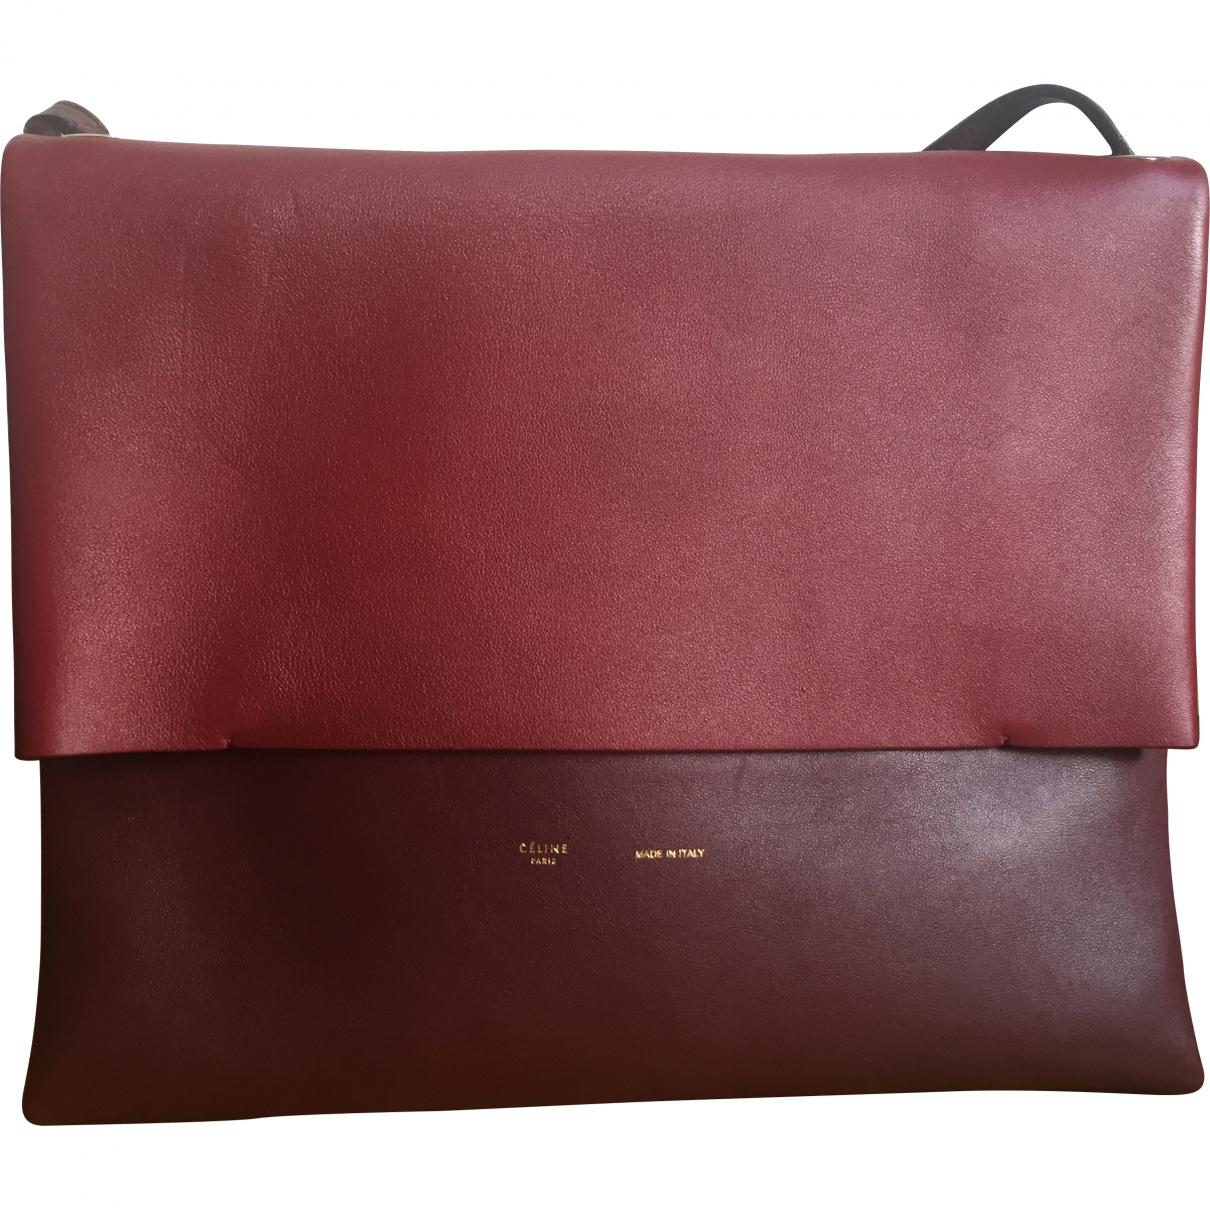 404d9e1060 Lyst - Céline Pre-owned All Soft Leather Handbag